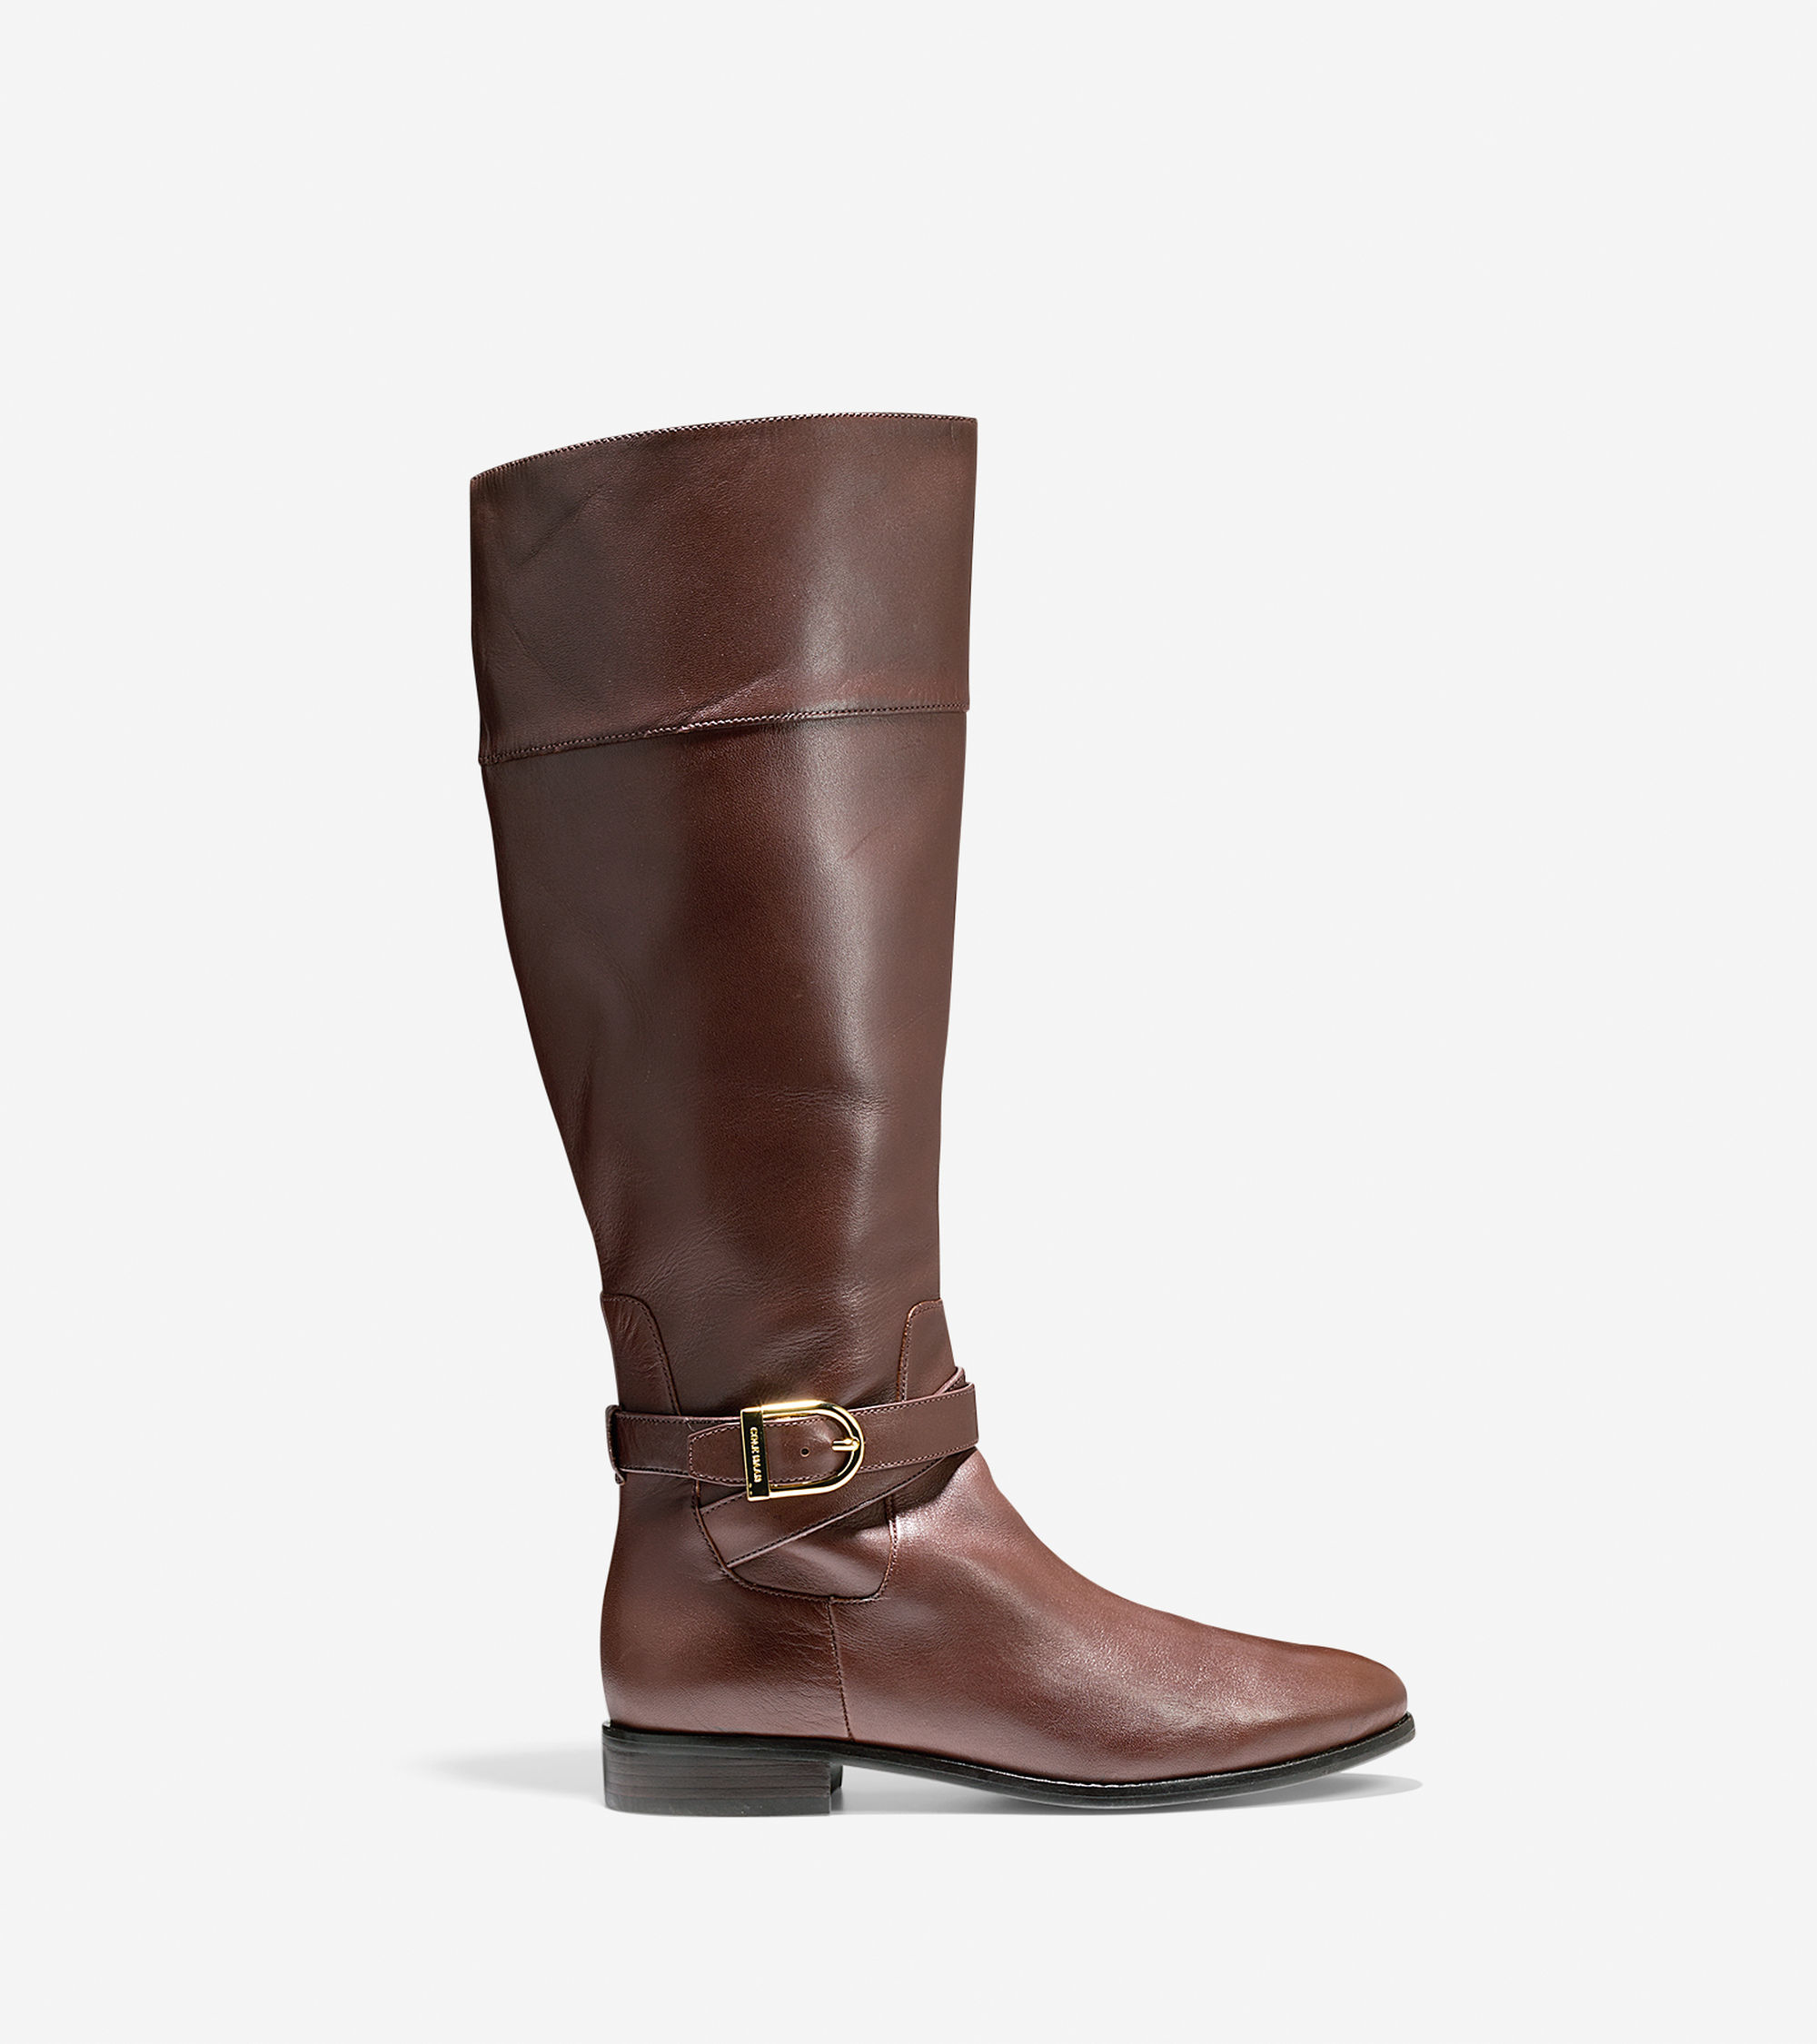 Lyst - Cole Haan Catskills Boot